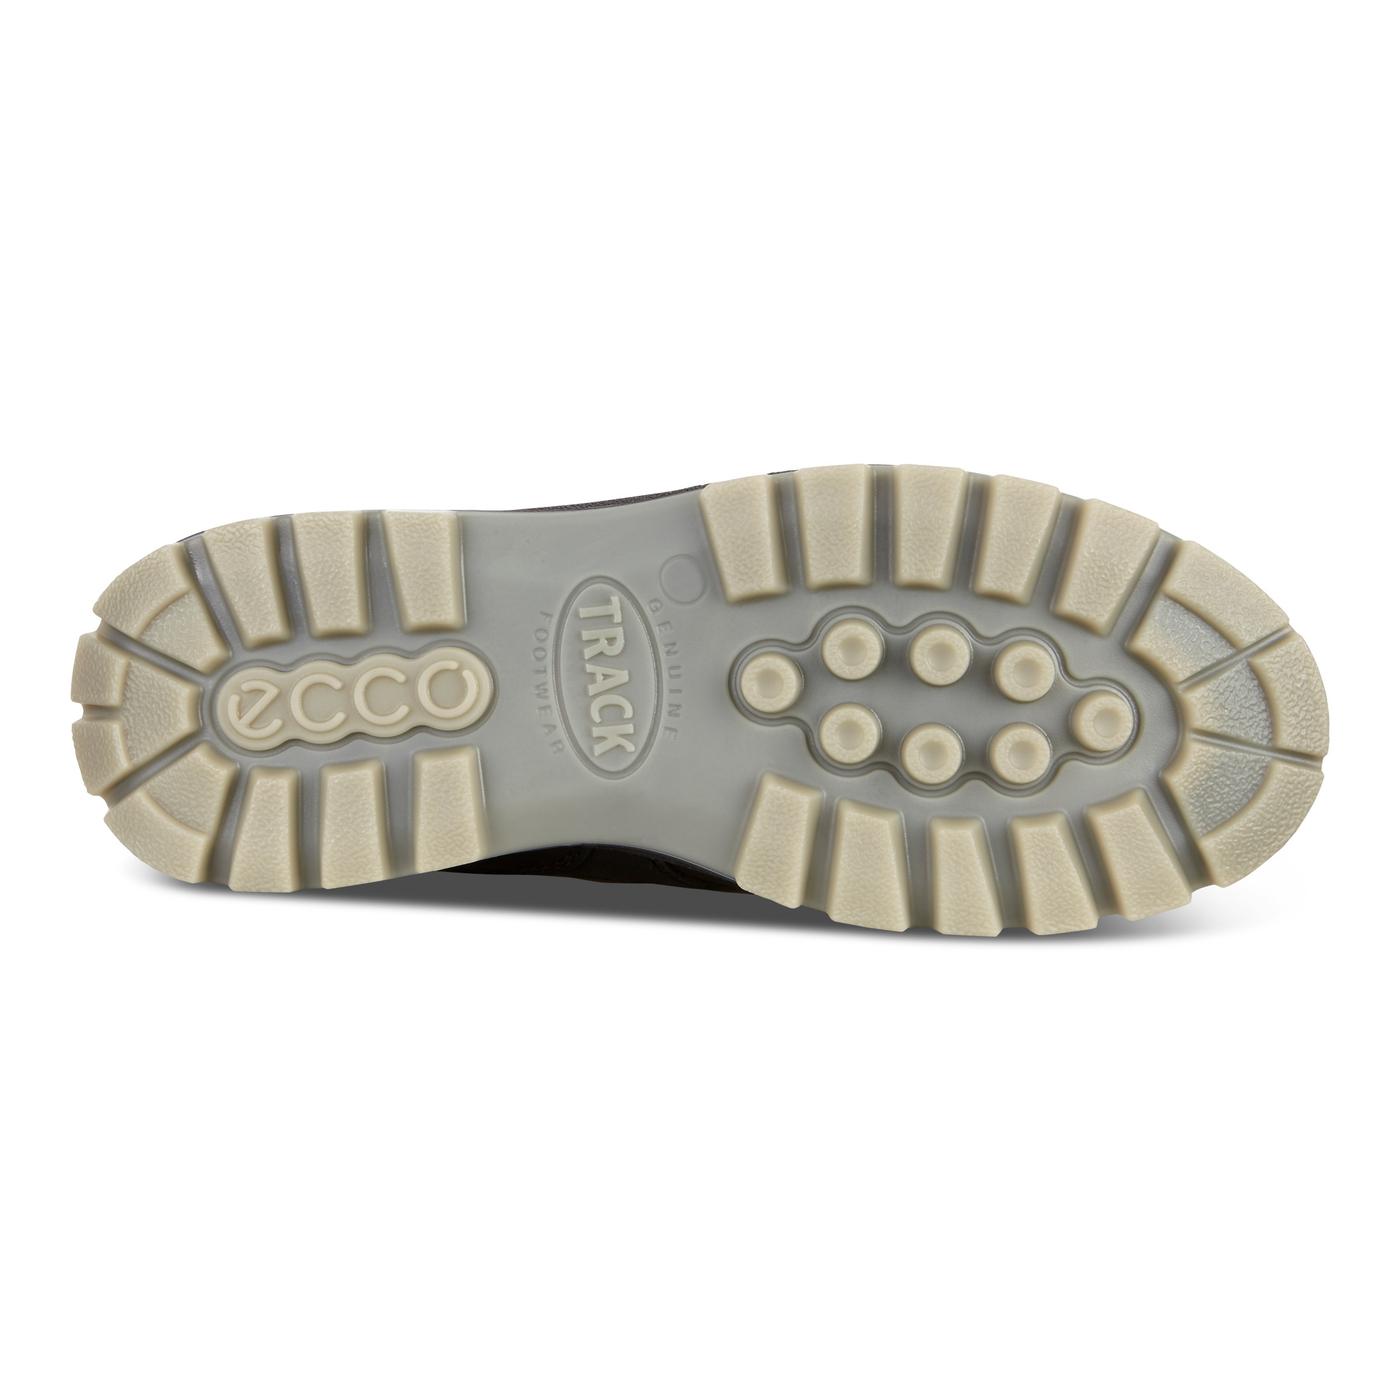 ECCO Mens Track 25 Shoe